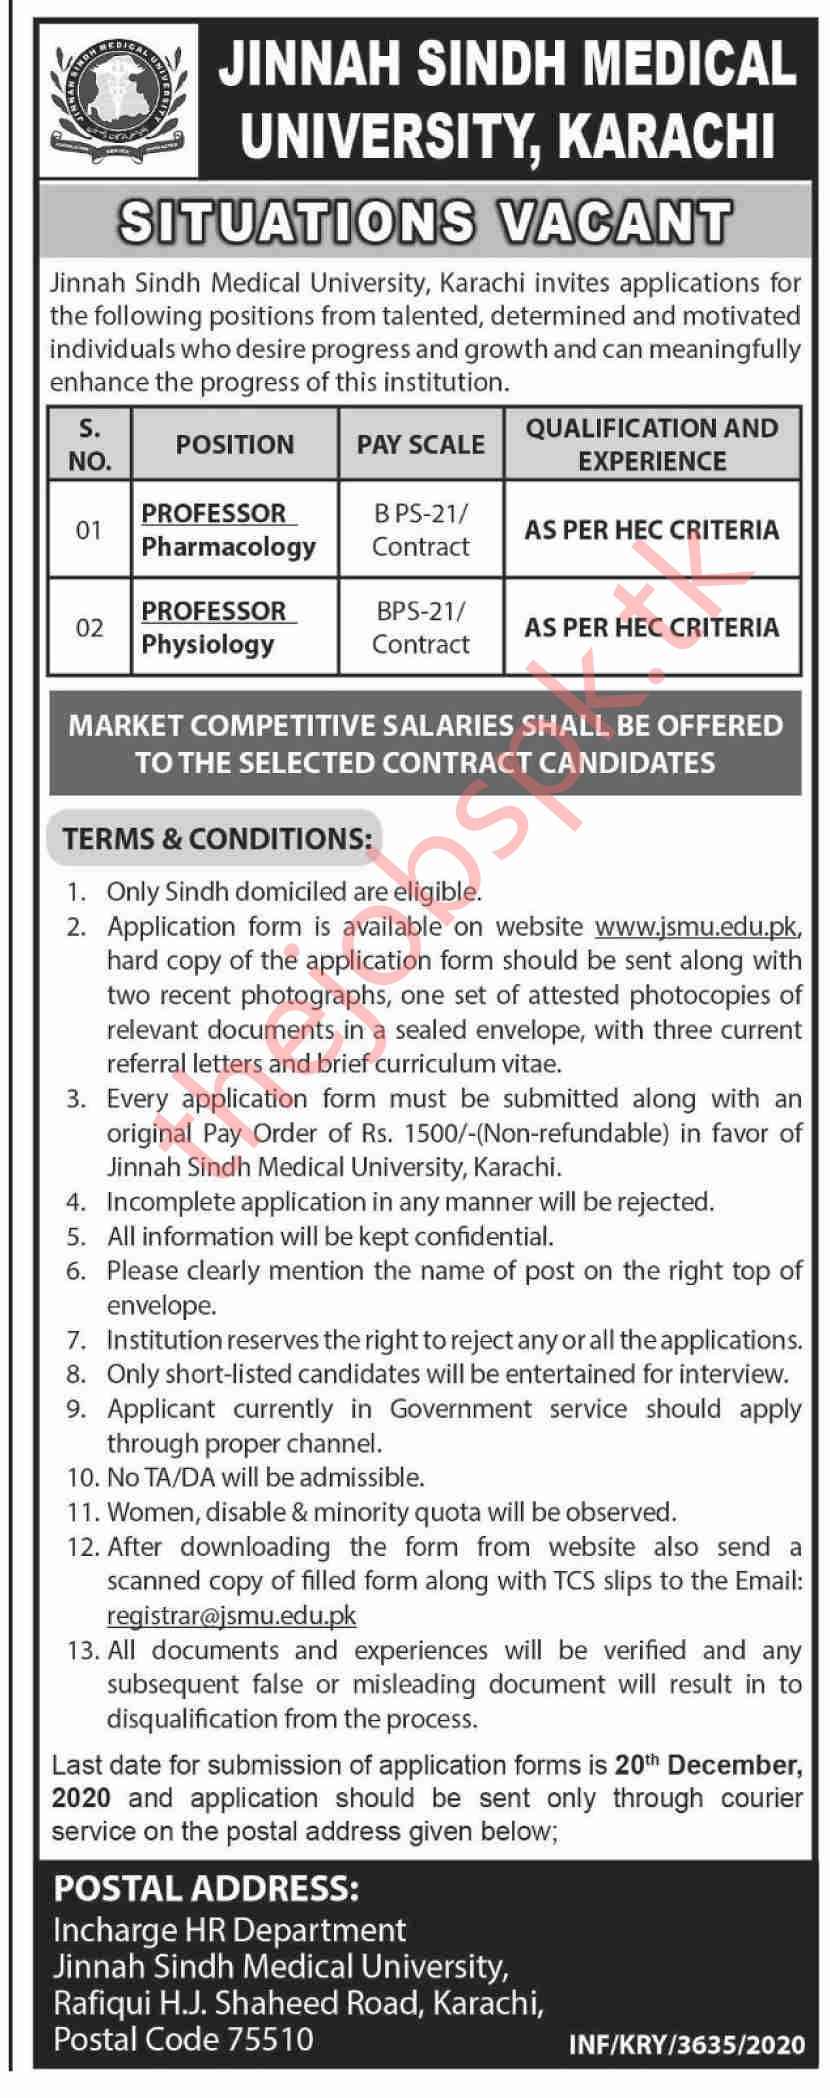 Jinnah Sindh Medical University Jobs 2020 Latest